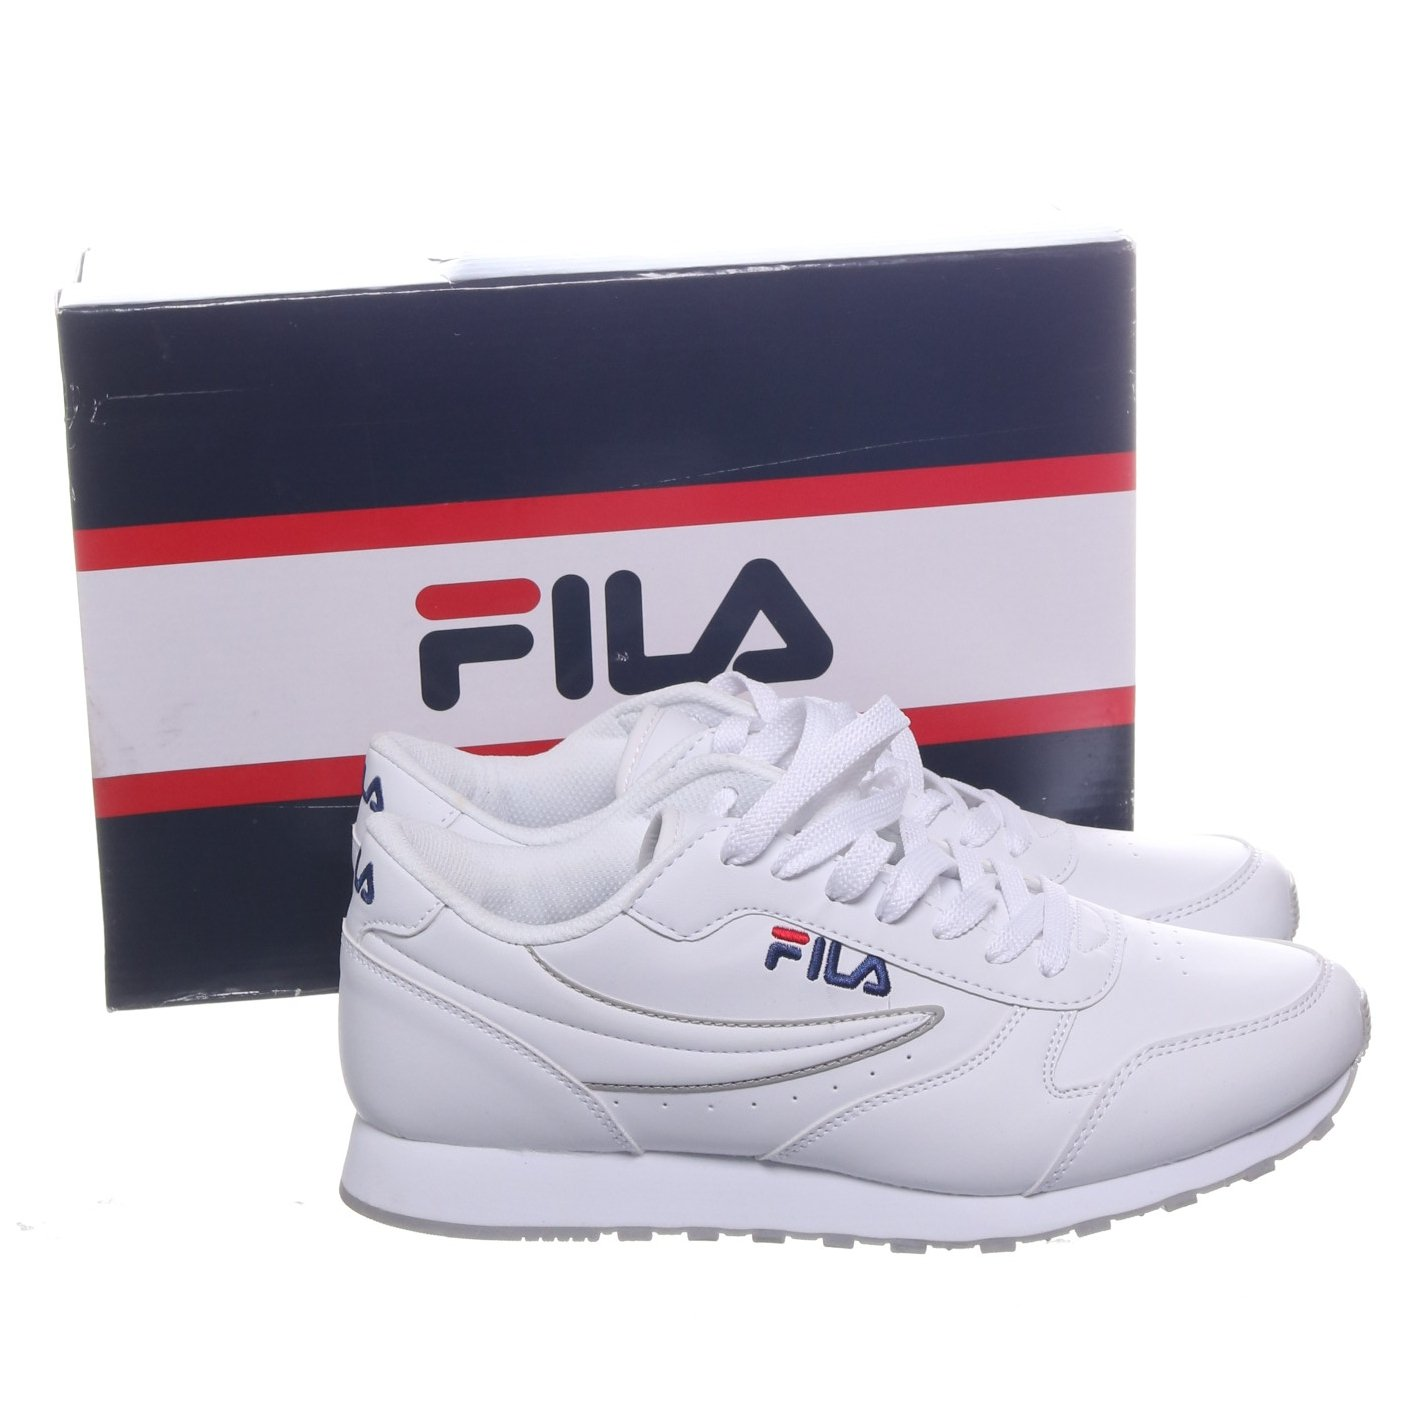 Fila, Sneakers, Strl: 42, Orbit Low, Vit, Skinn